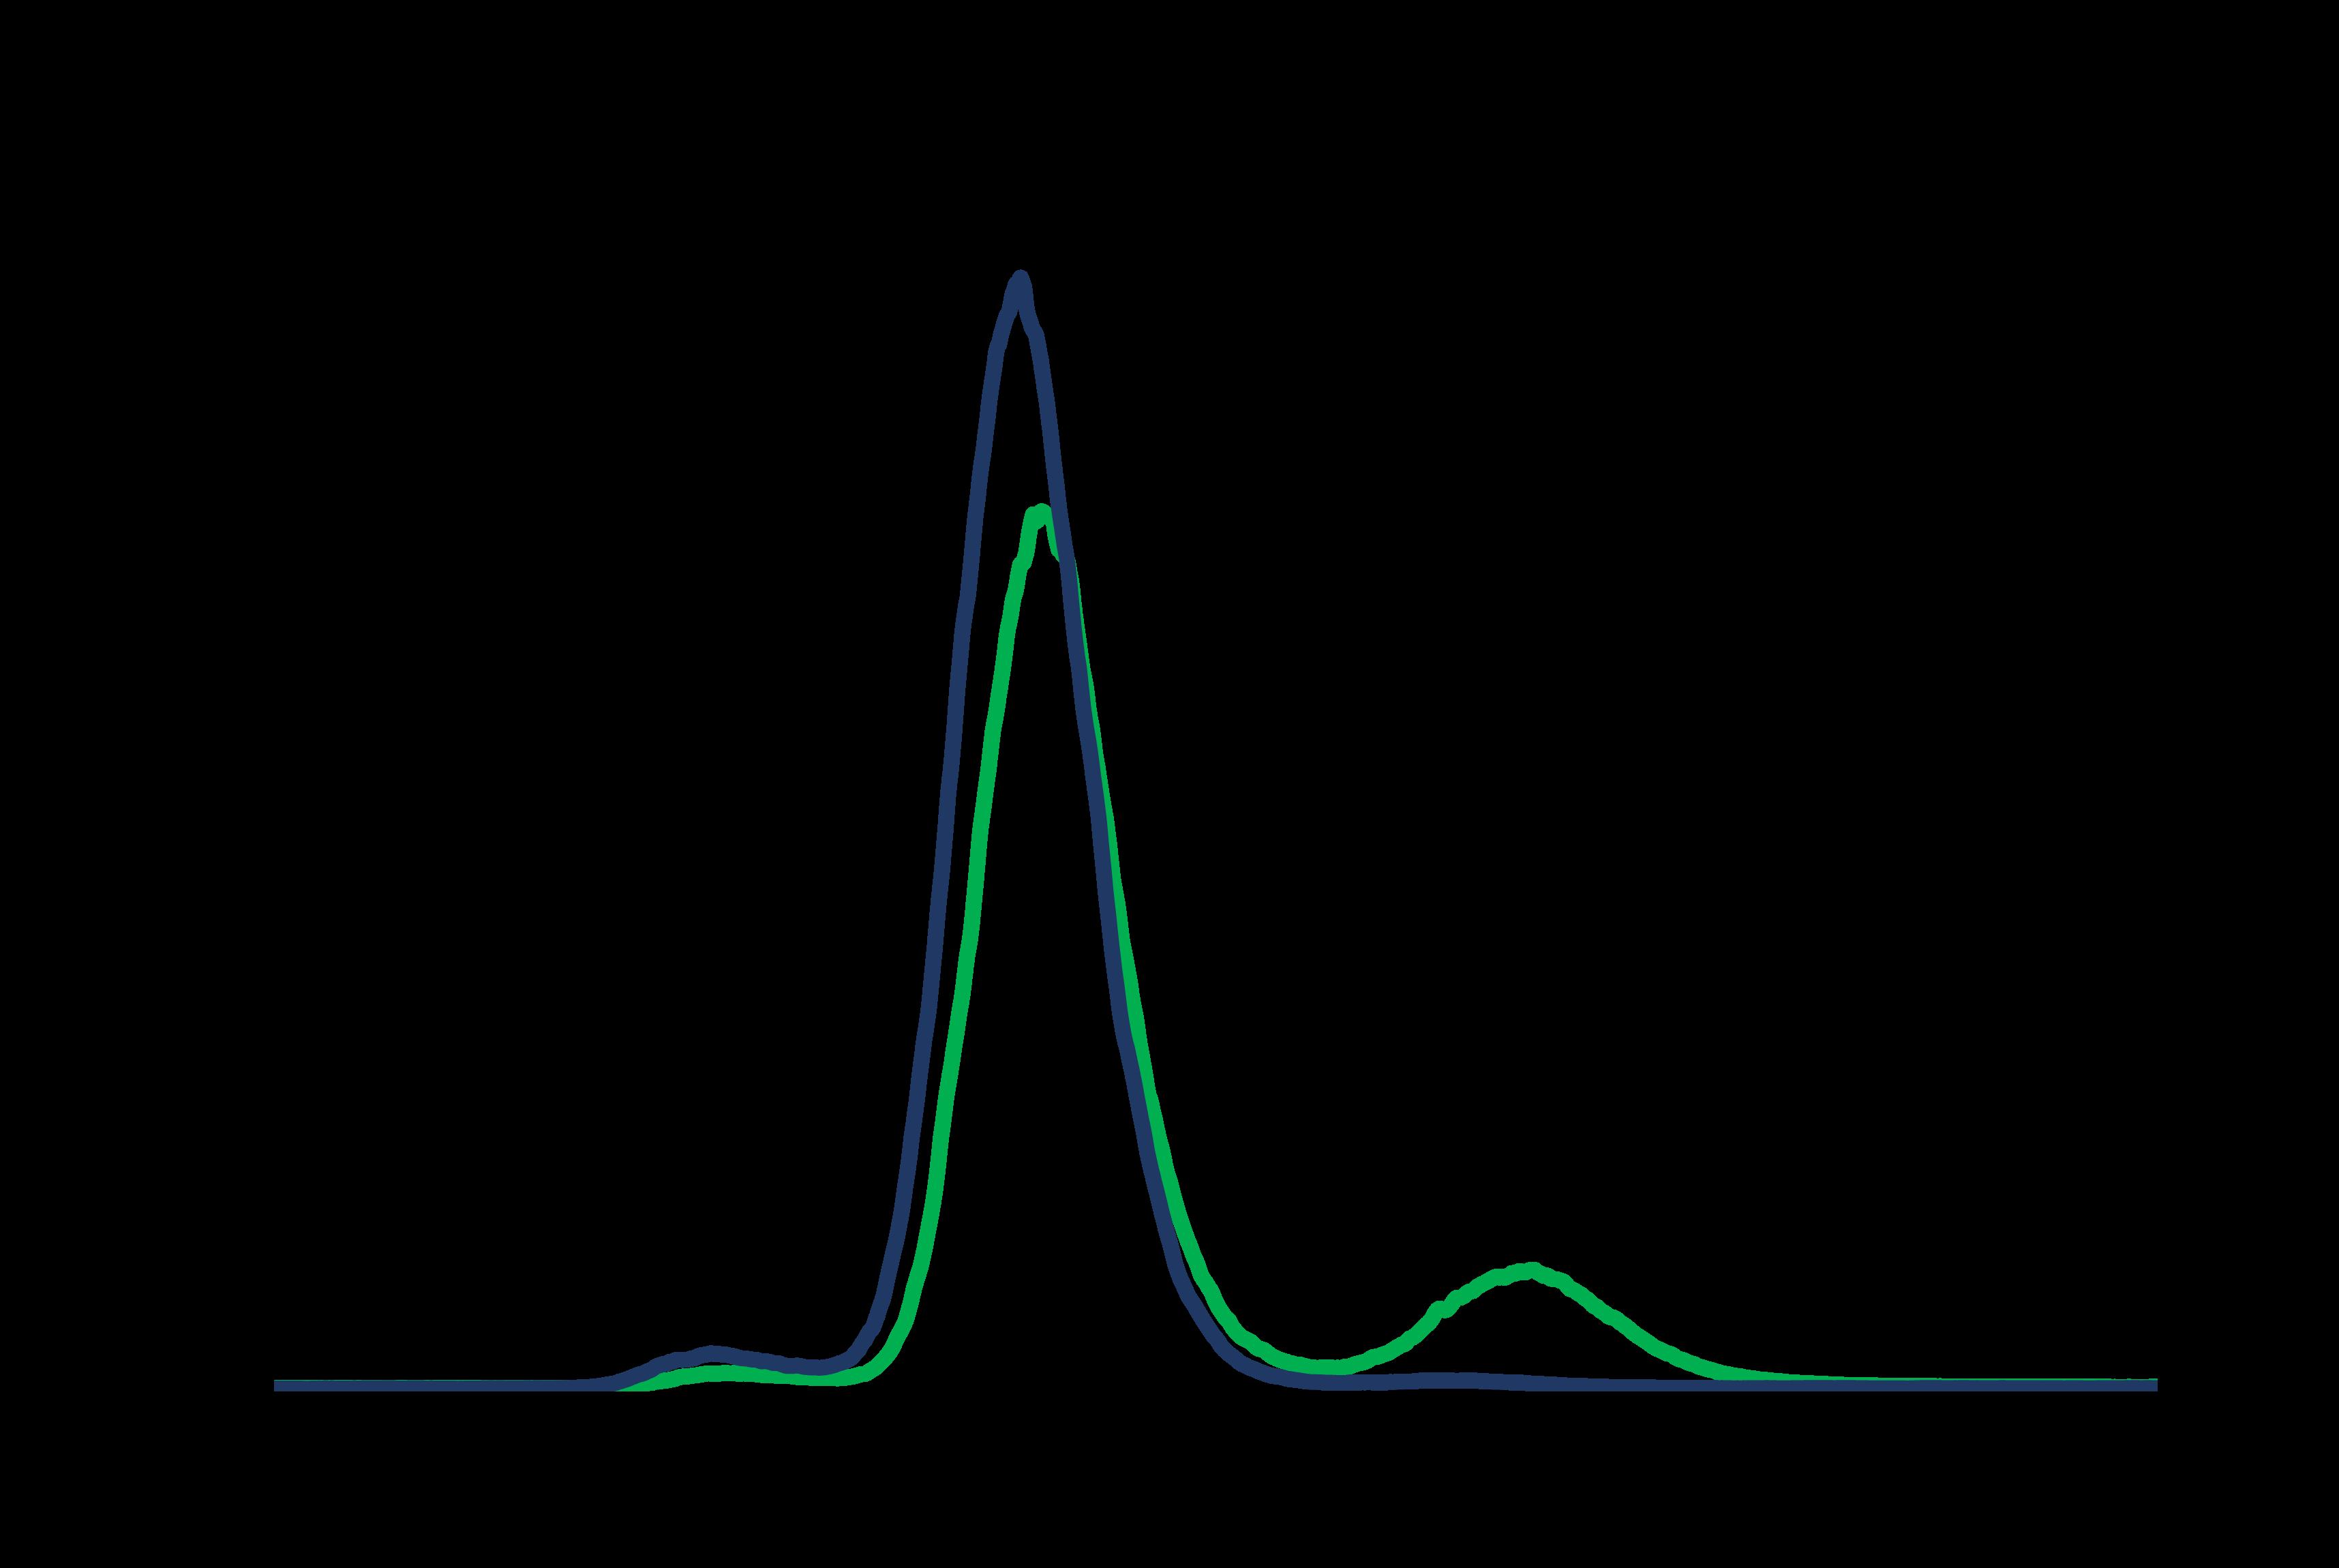 Supercritical fraction of poloxamer 407